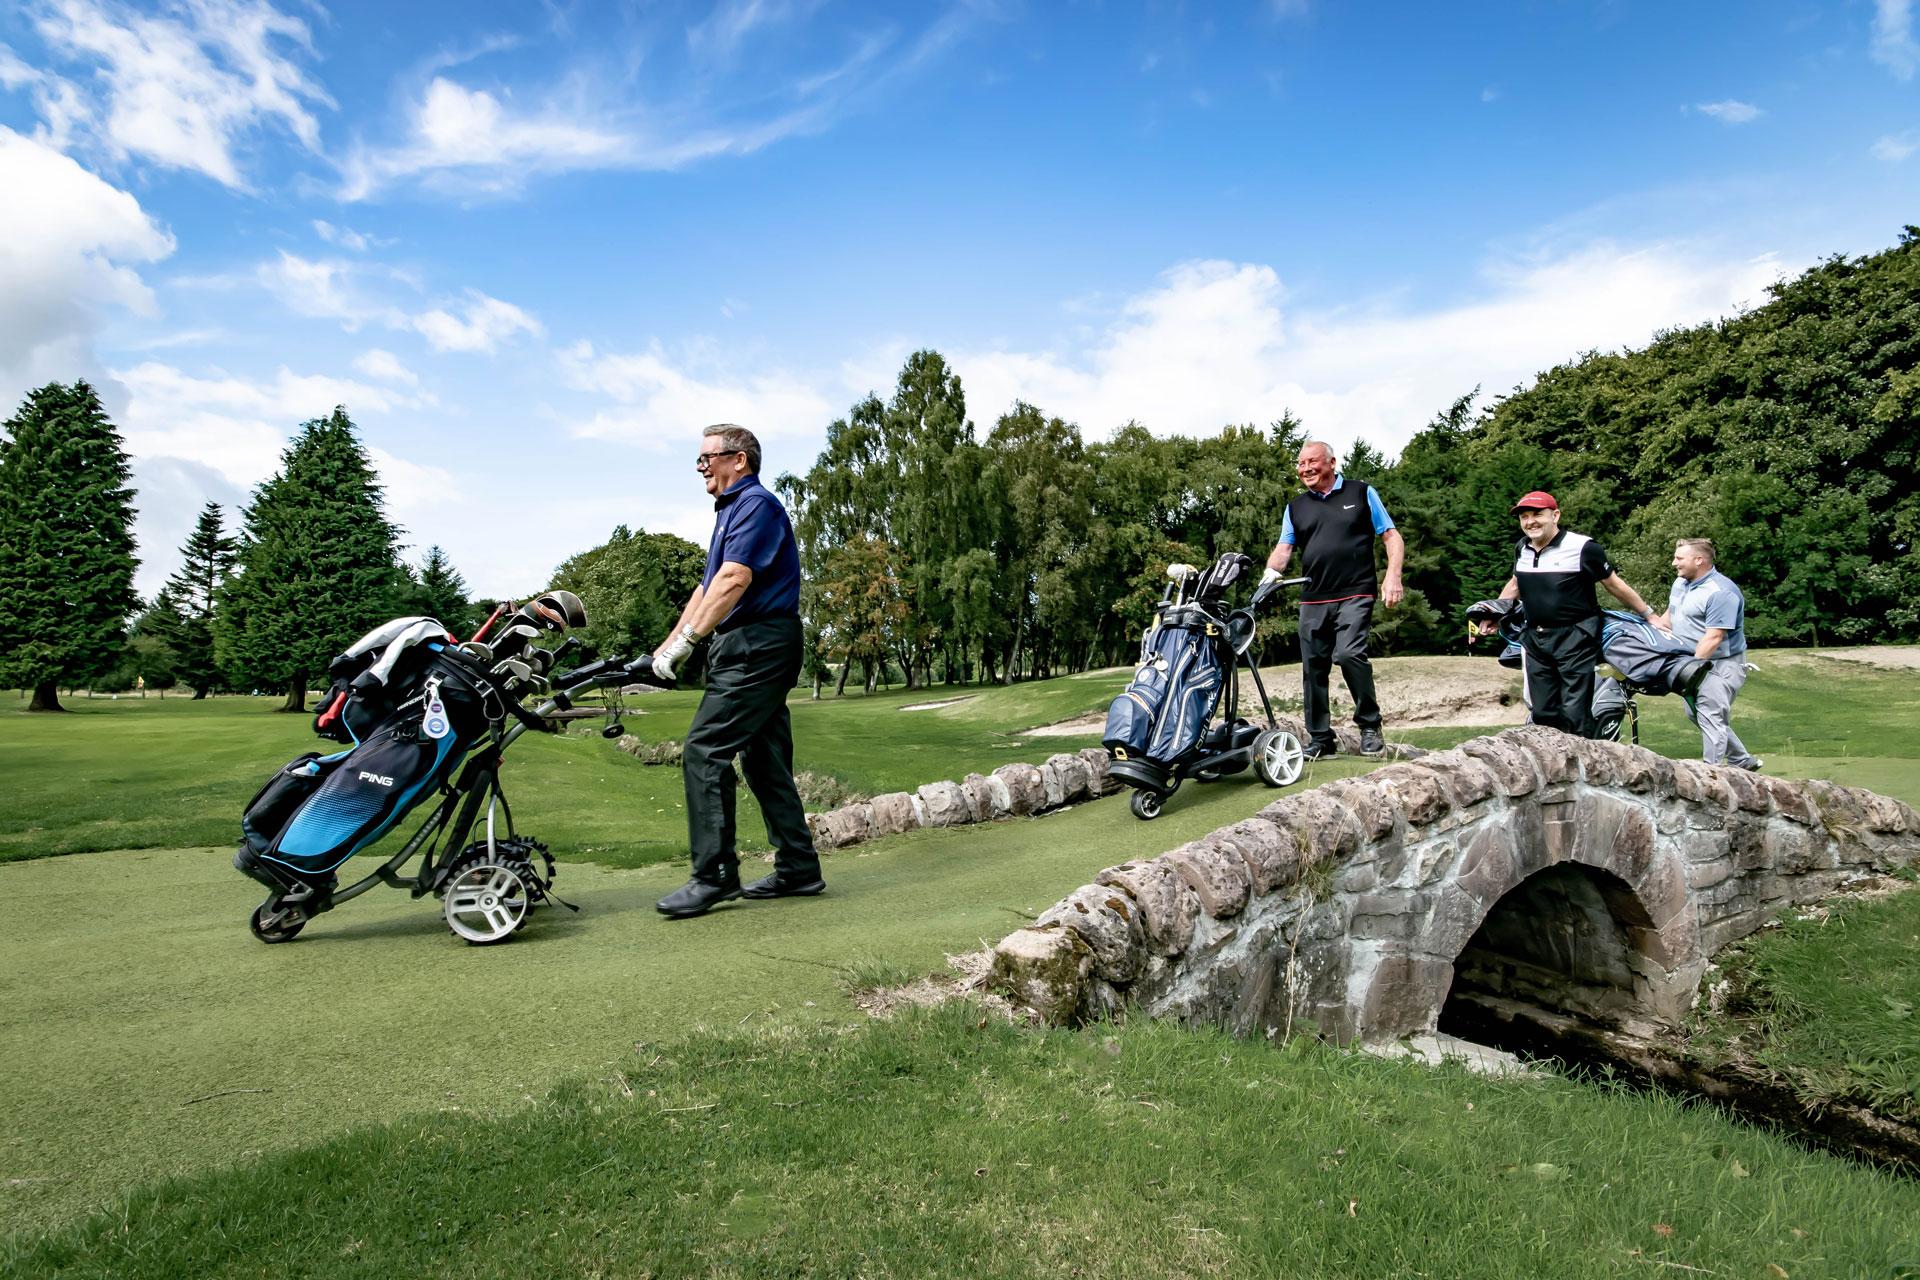 Bishopbriggs_Golf_Club_Aug_2021_Lucy_Knott_Photography-(14)